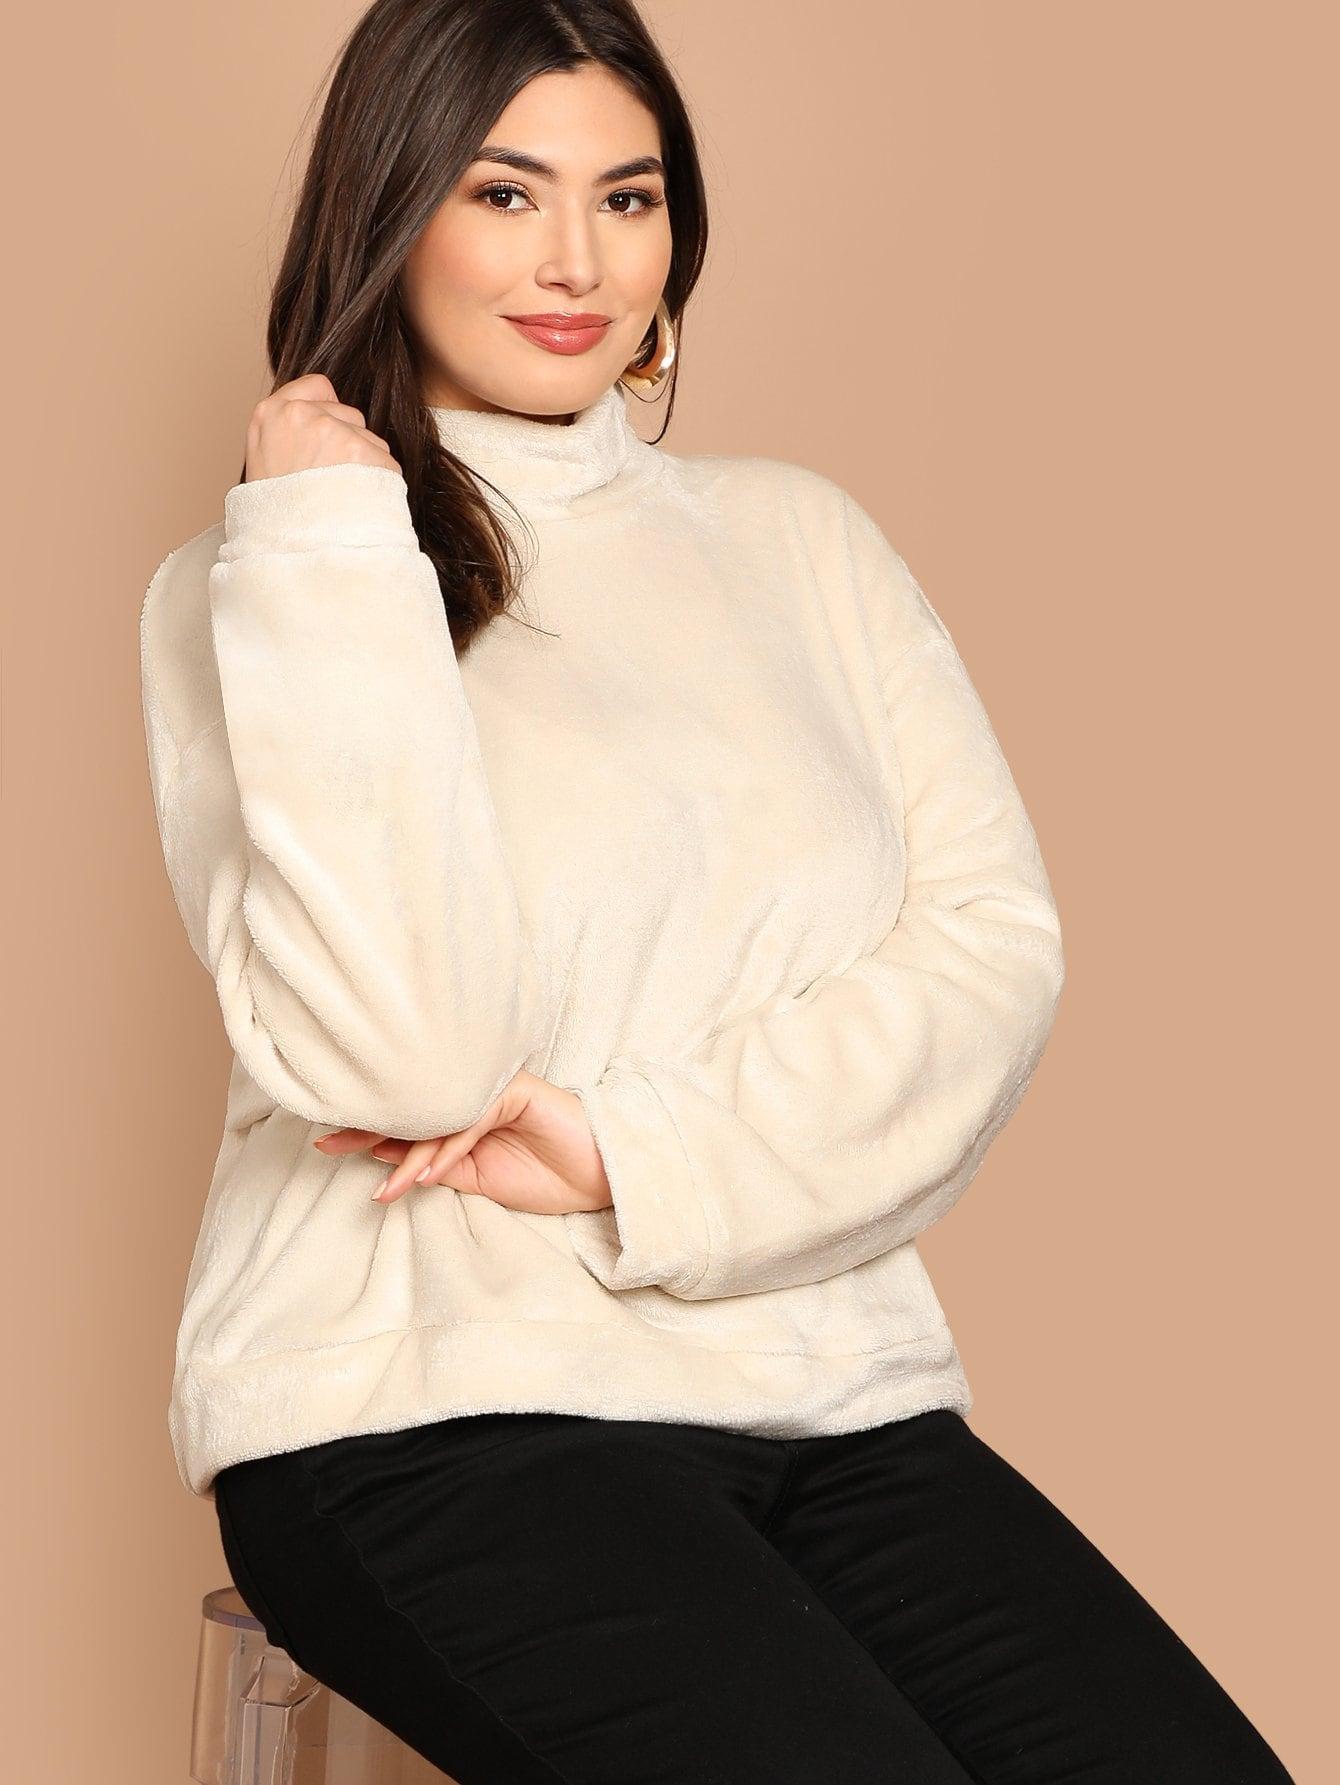 Фото - Плюс размера тедди пуловер с заниженной линией плеч от SheIn цвет бежевые